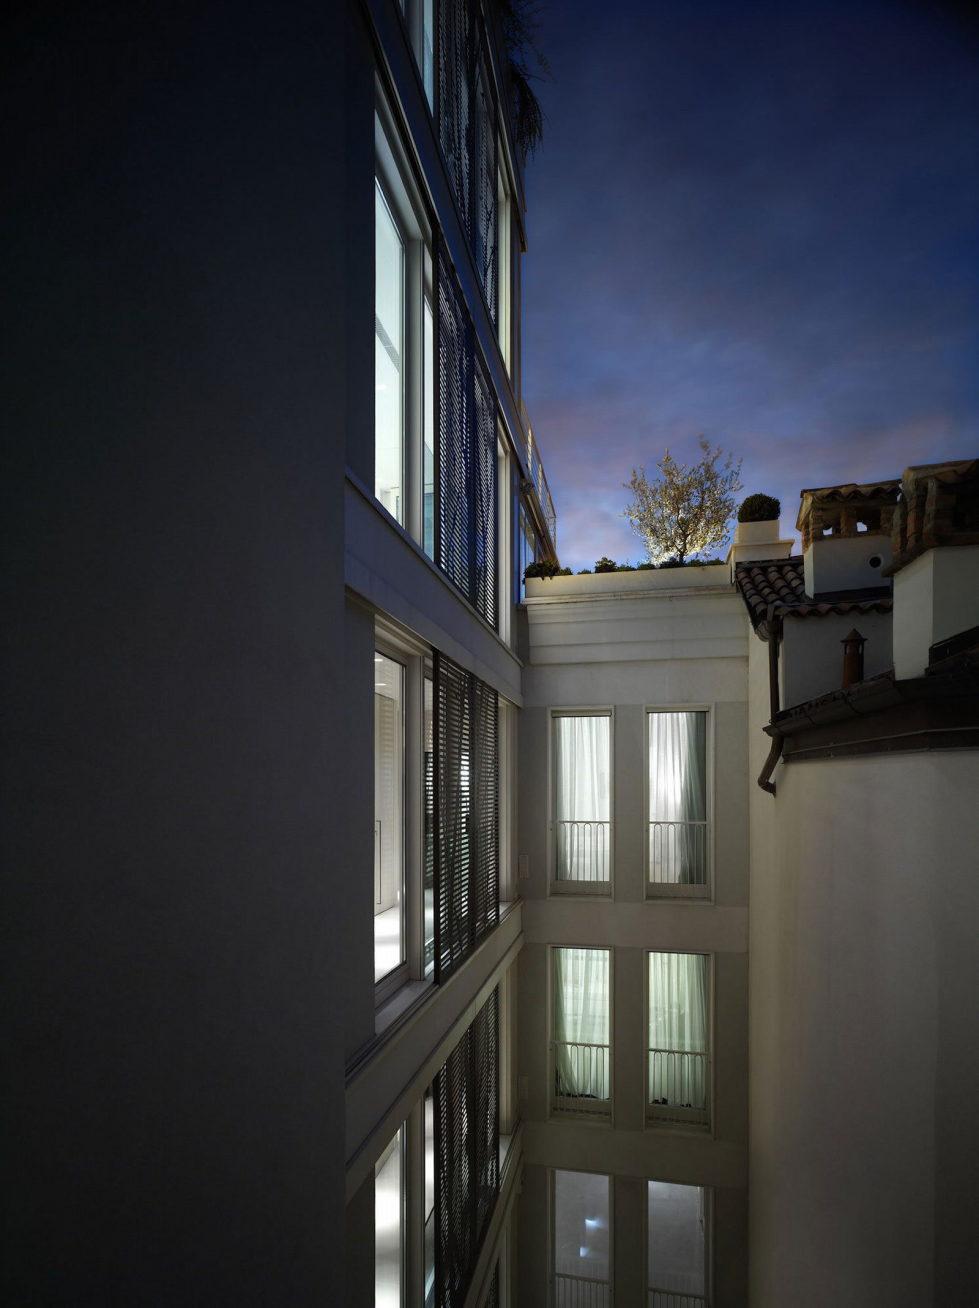 Three-level Apartments In Milan From Arassociati Architetti 23